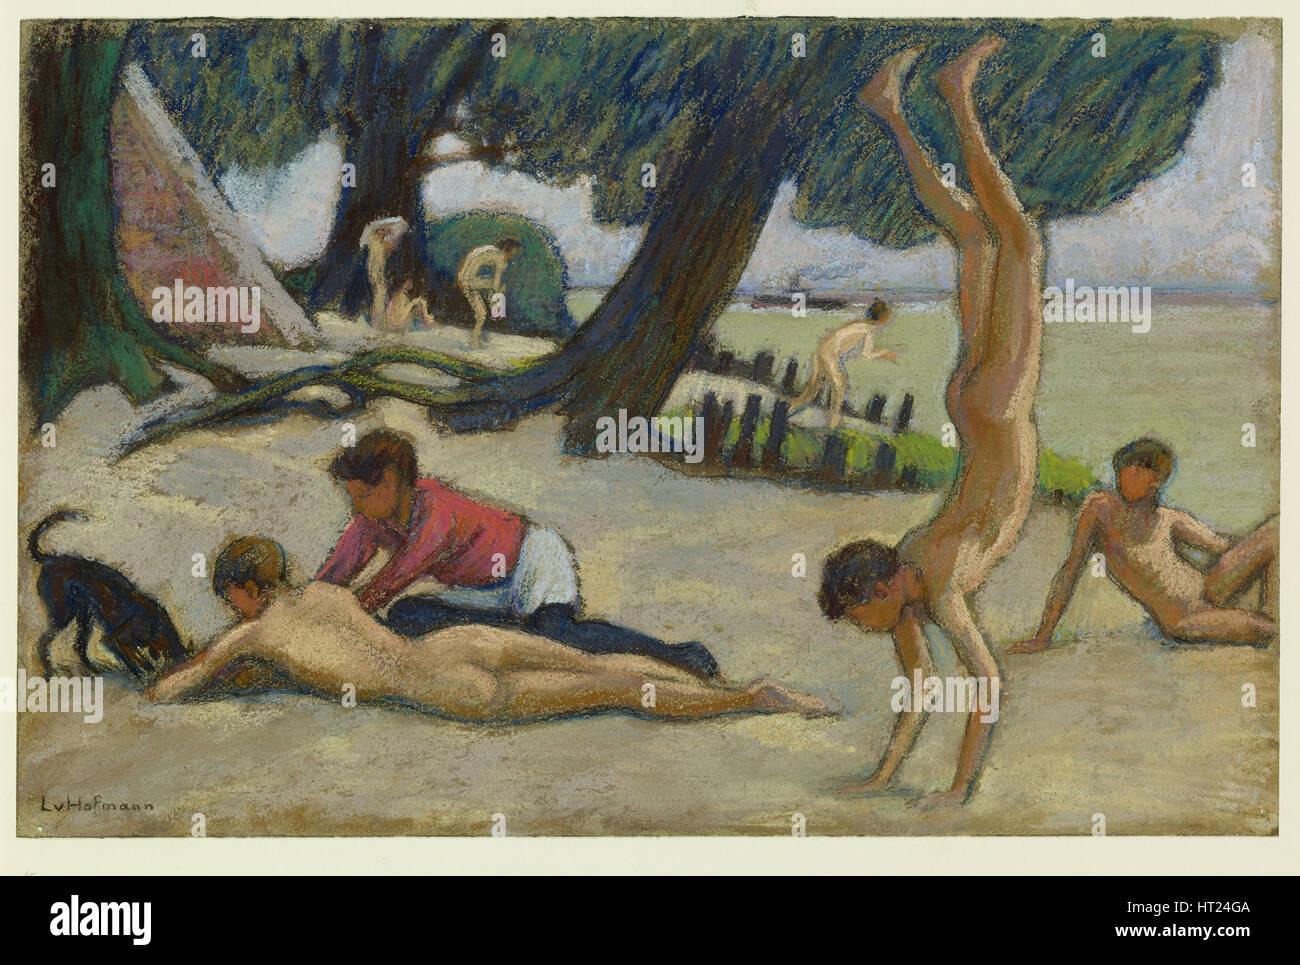 Boys on the beach, c. 1895. Artist: Hofmann, Ludwig, von (1861-1945) - Stock Image